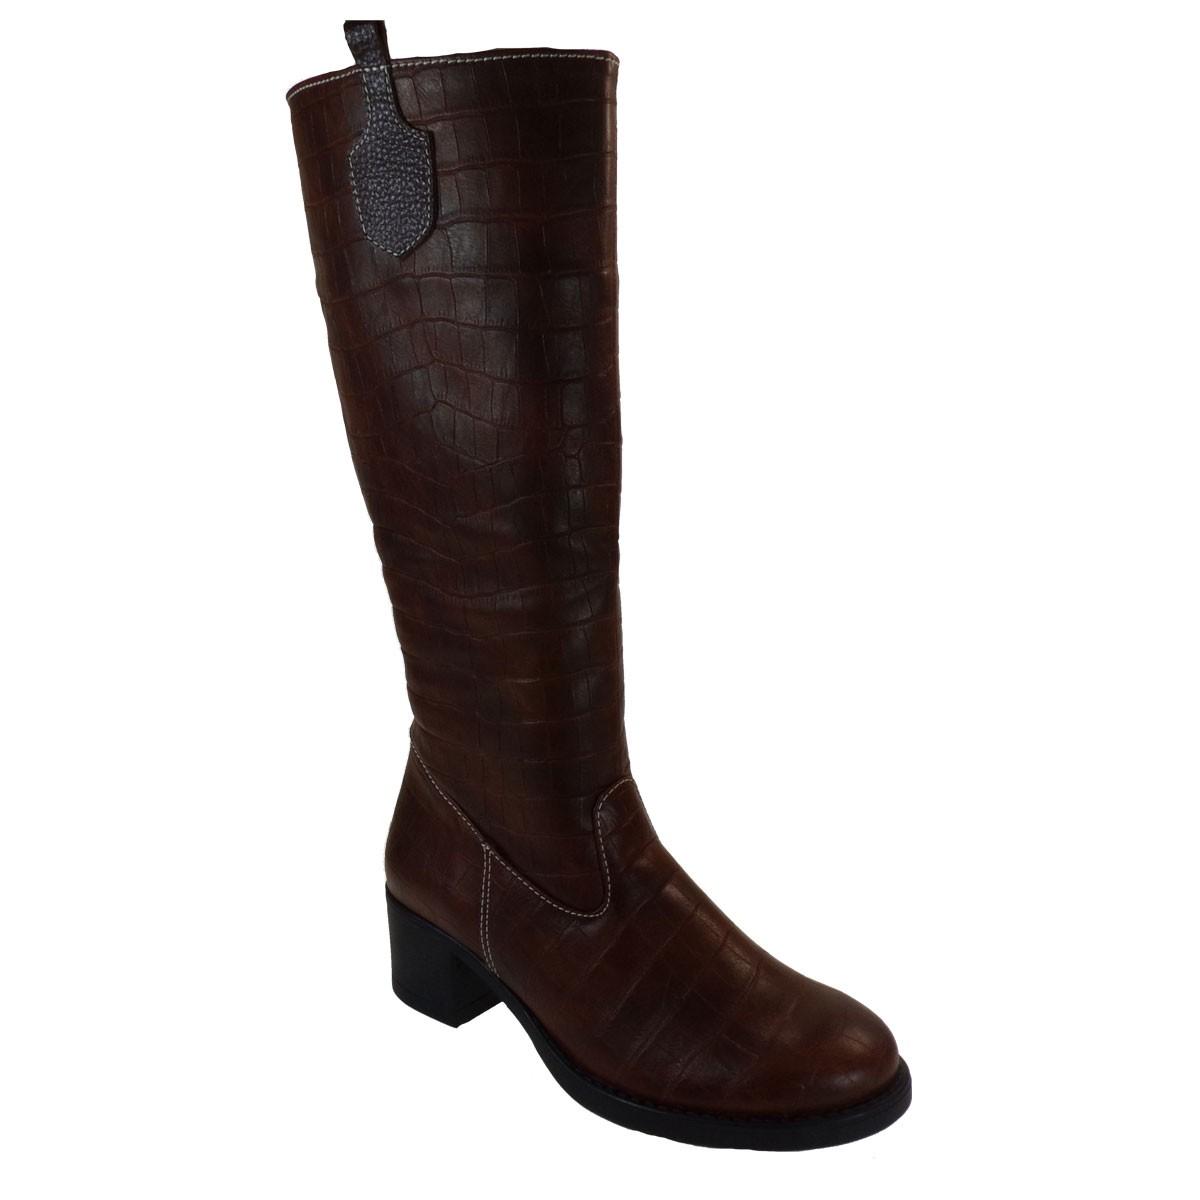 Katia shoes Γυναικεία Παπούτσια Μπότες Α73-Β Σοκολά Κροκό